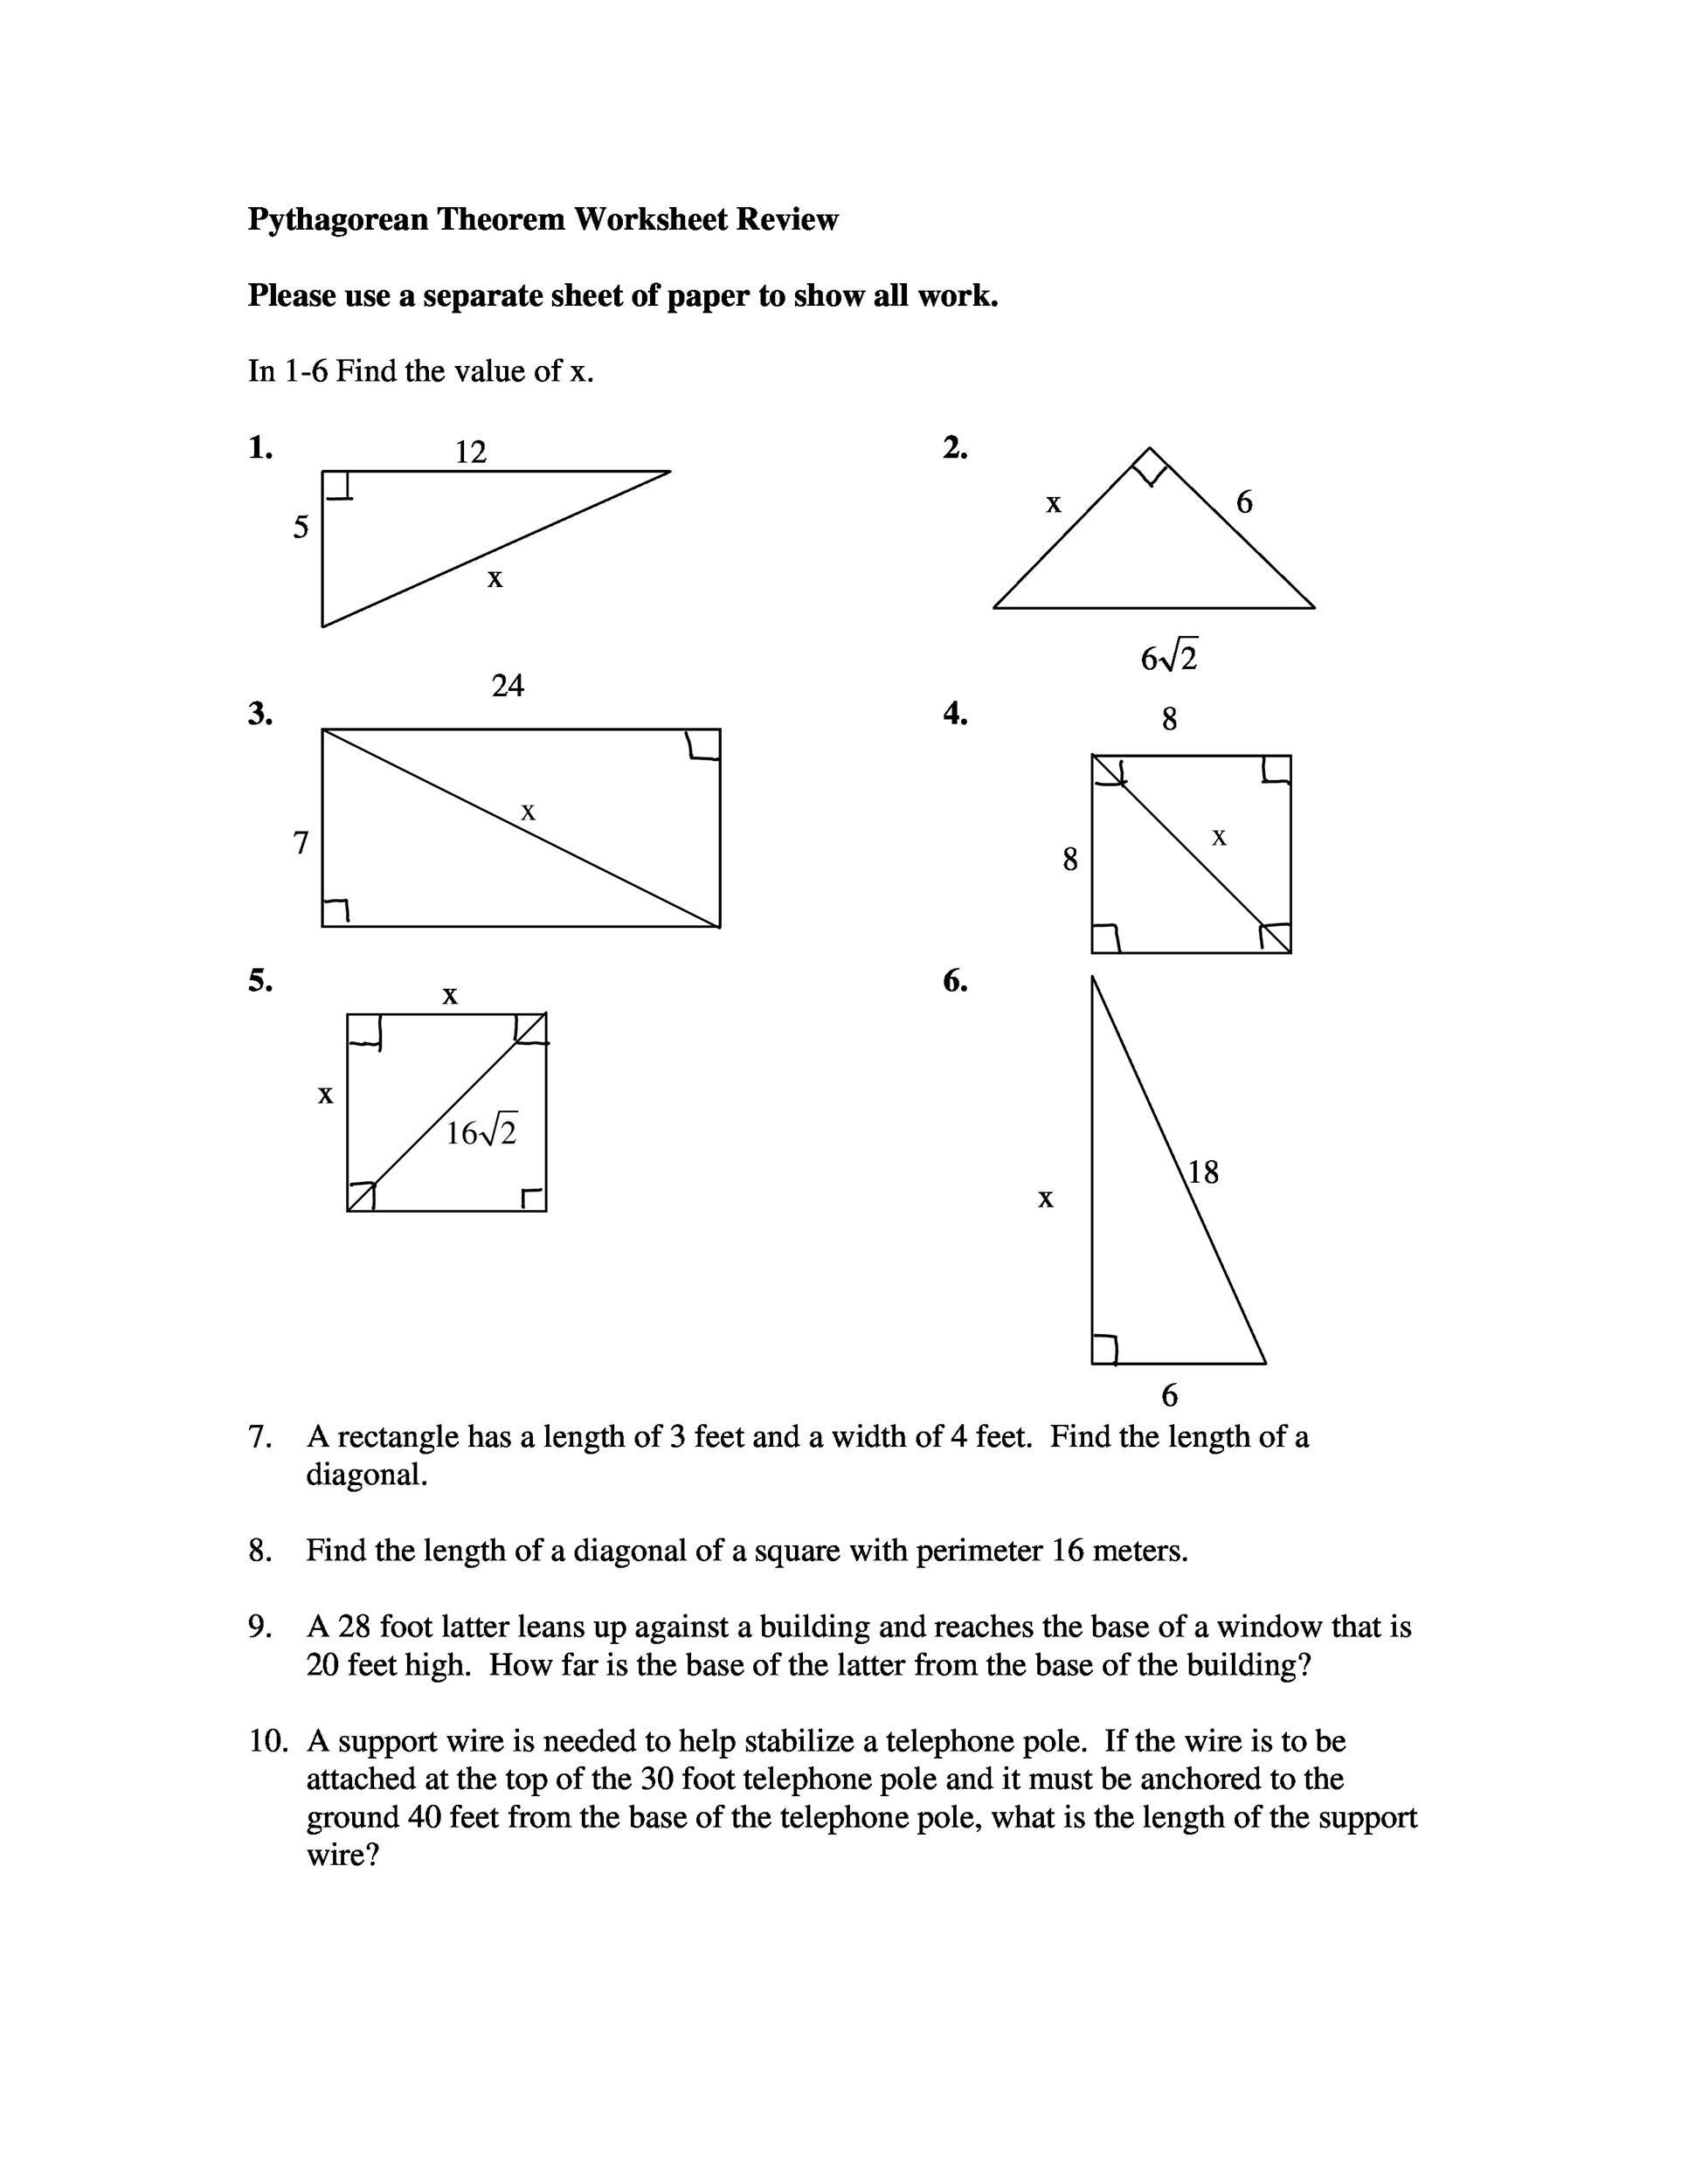 Pythagorean theorem Worksheet Answers Pythagorean theorem Perimeter Worksheet